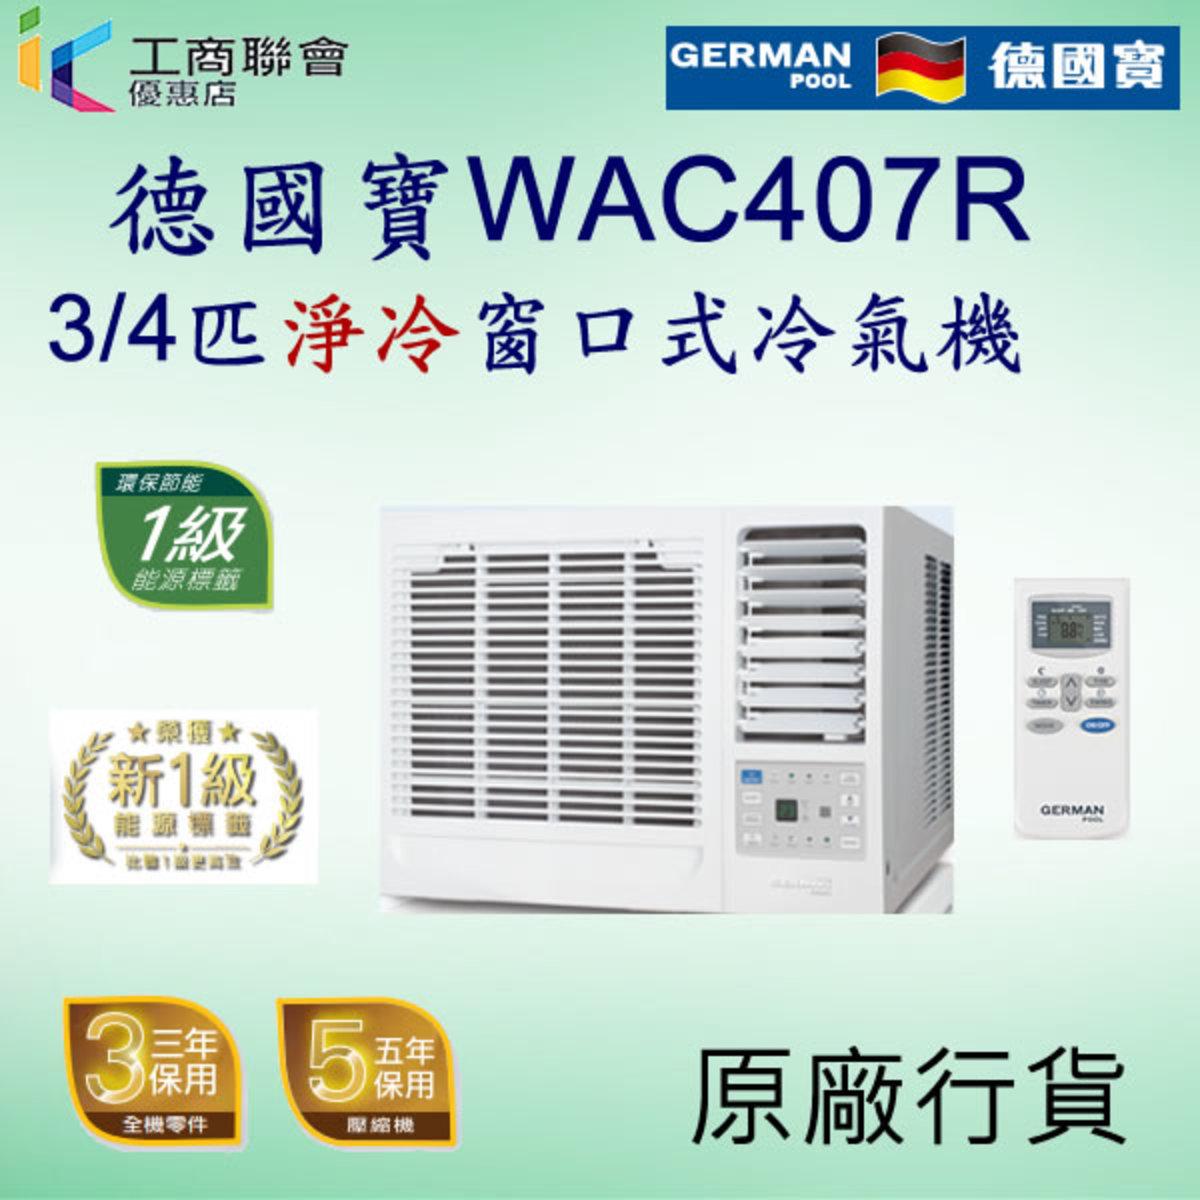 German Pool  WAC407R   3/4匹淨冷窗口式冷氣機(免費除舊服務)